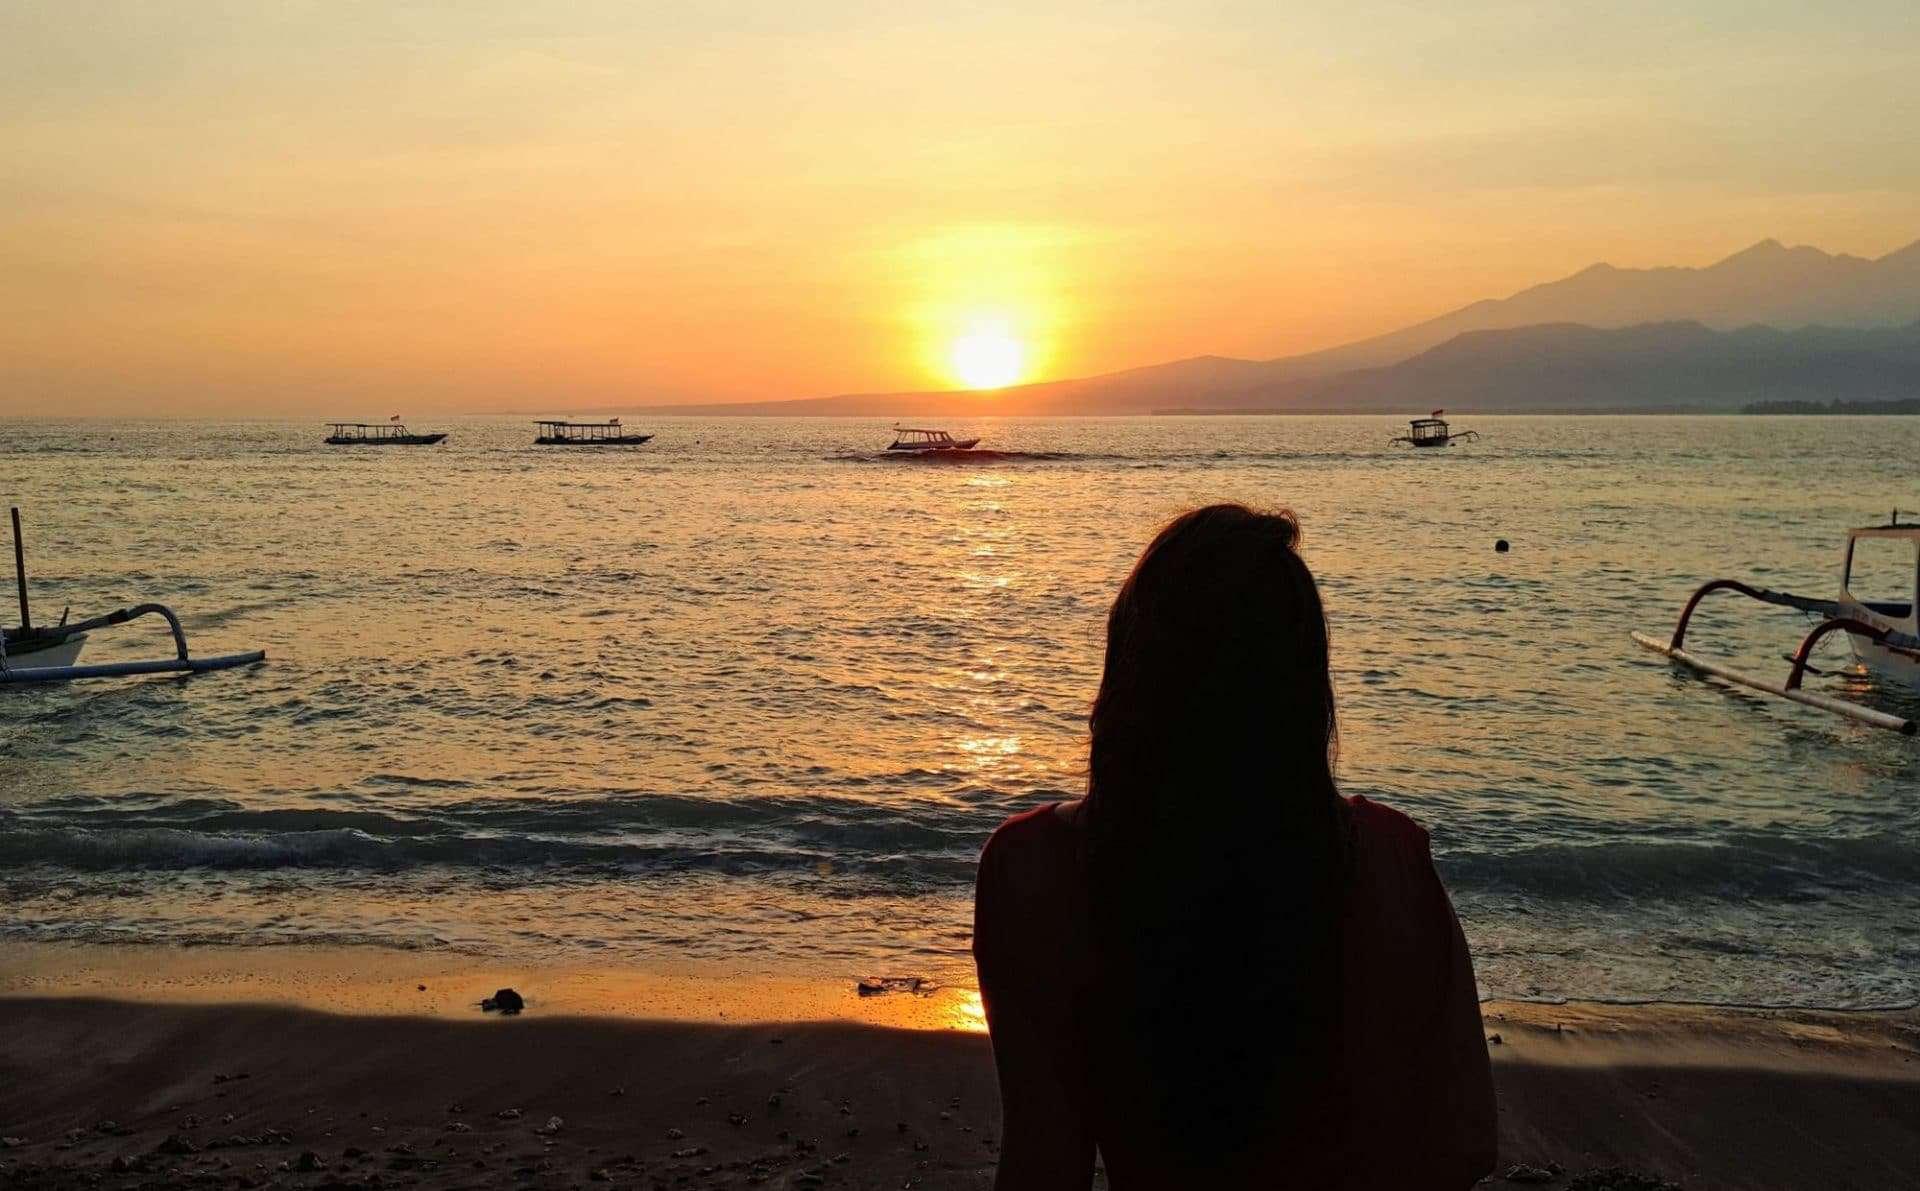 alba_indonesia_isole_gili